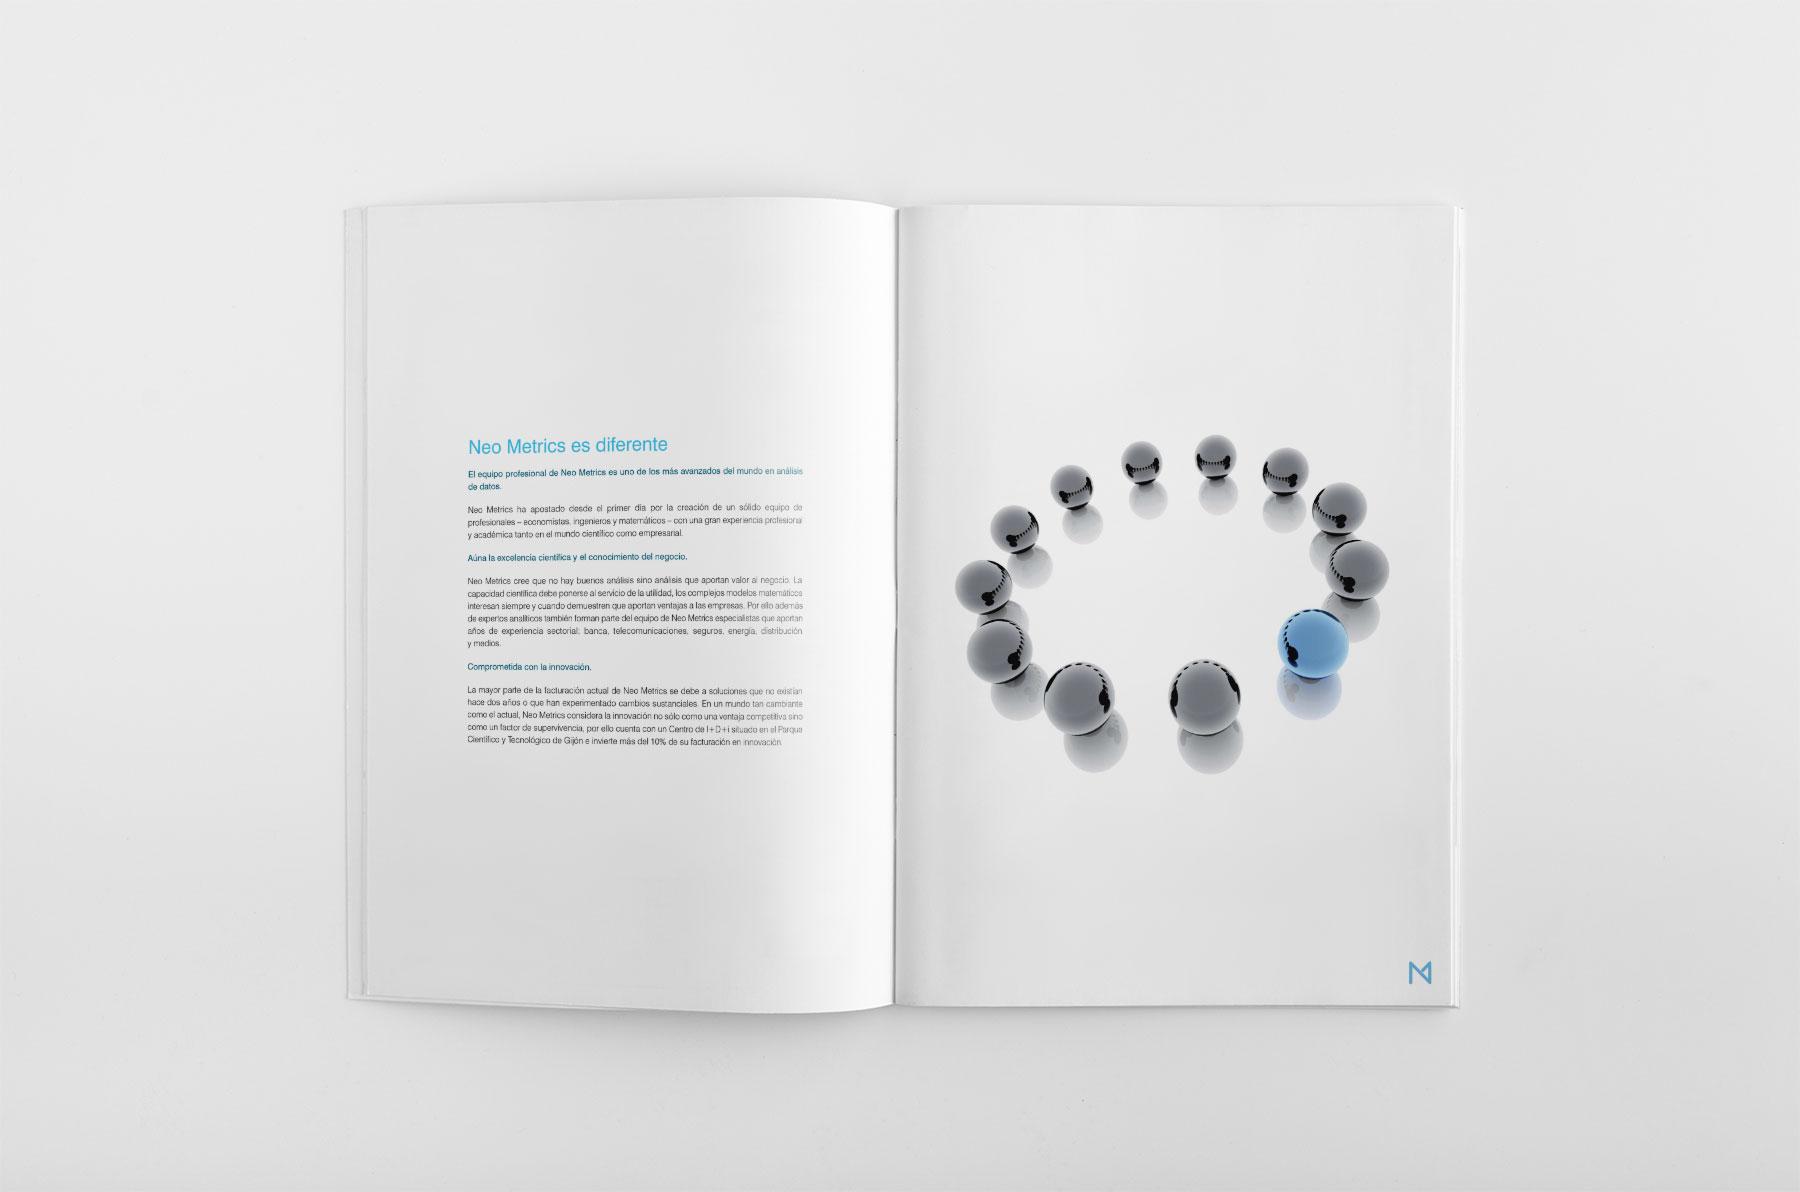 neometrics_brochure_010